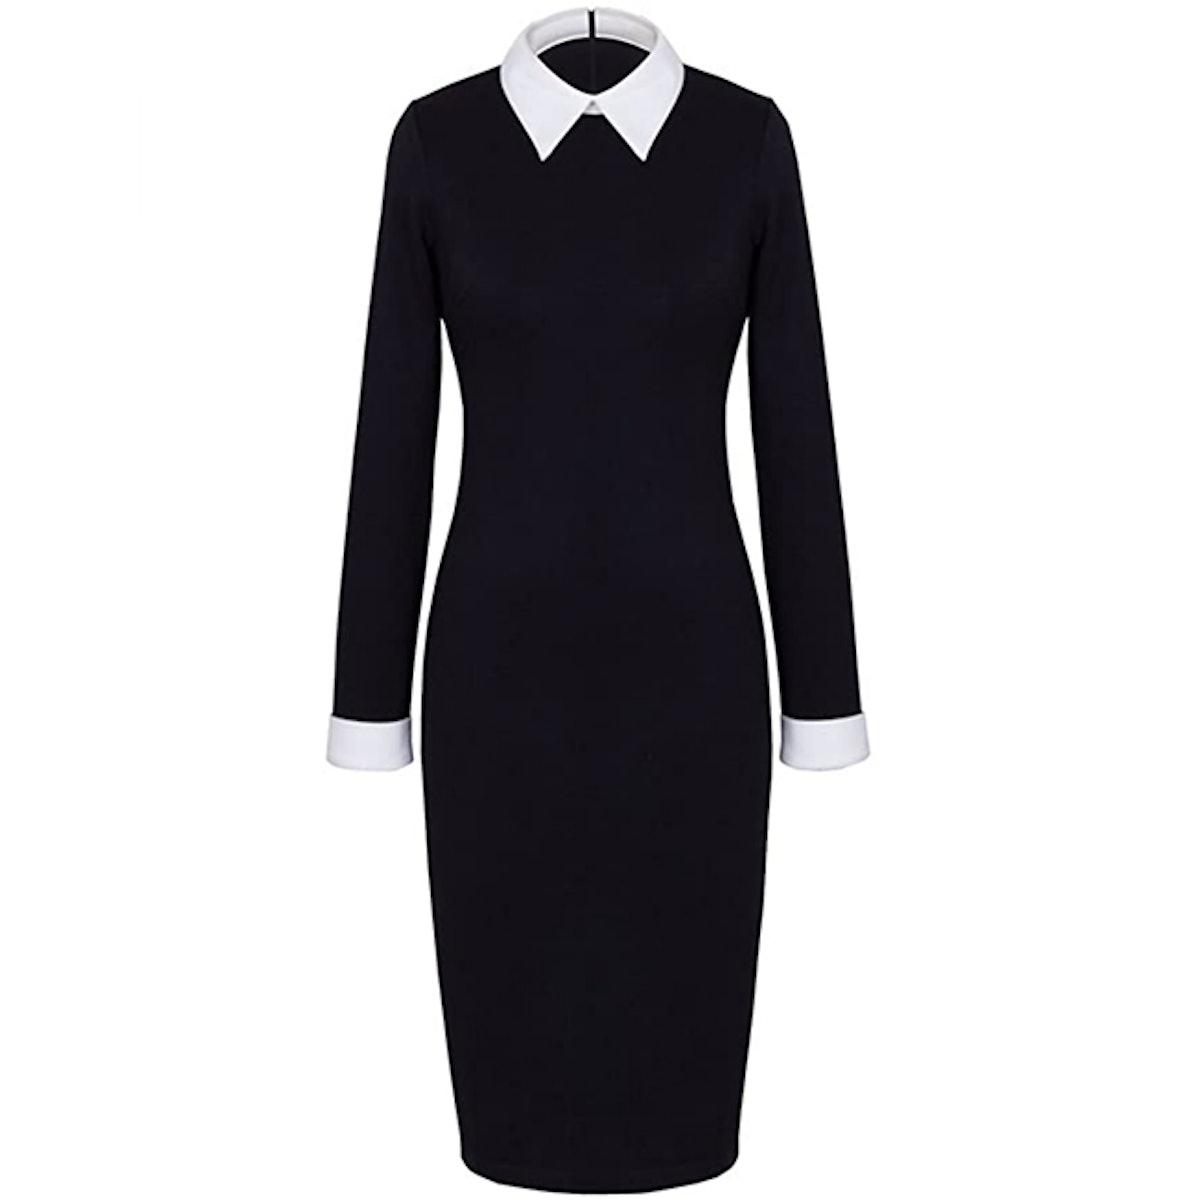 HOMEYEE Turn Down Collar Dress